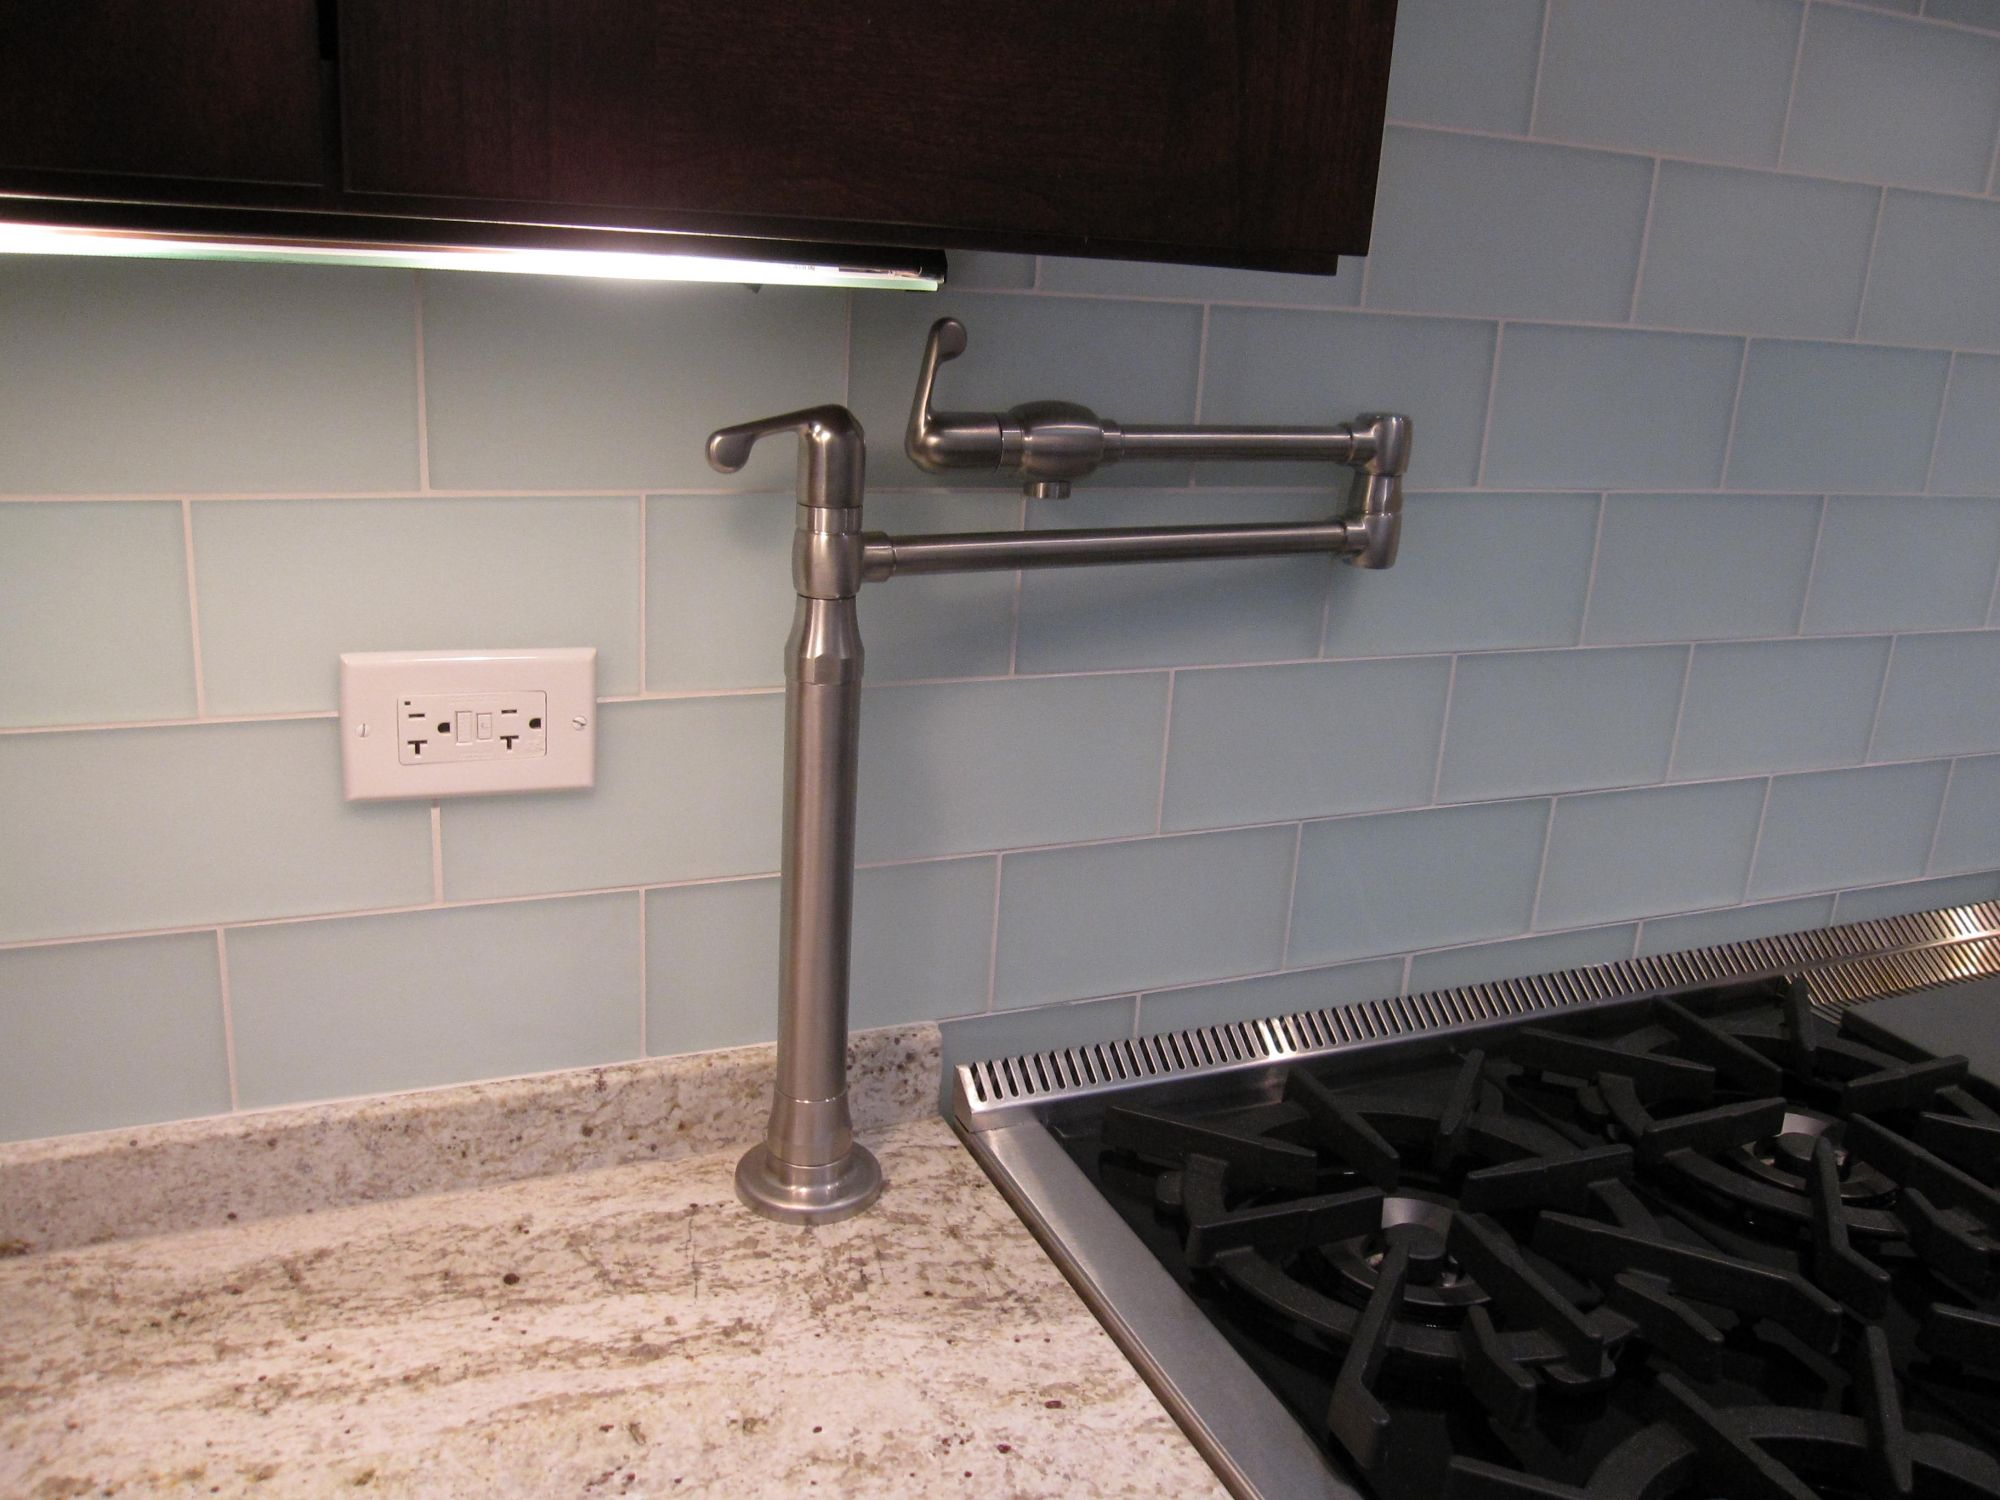 Countertop Mounted Pot Filler Faucet I Wonder If It Could Slide